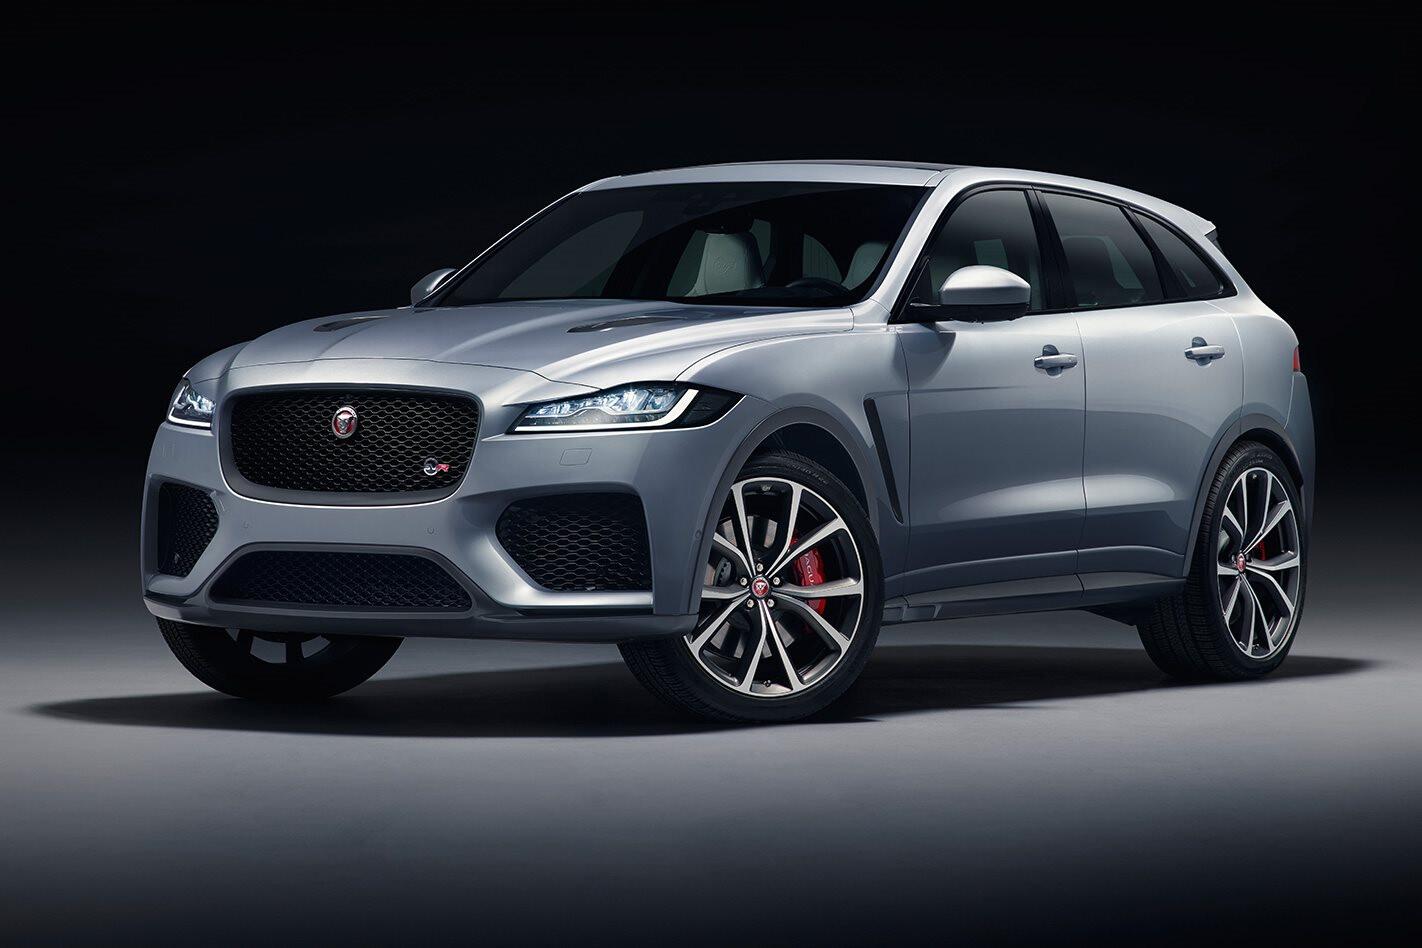 2018 New York Motor Show Jaguar F-Pace SVR revealed